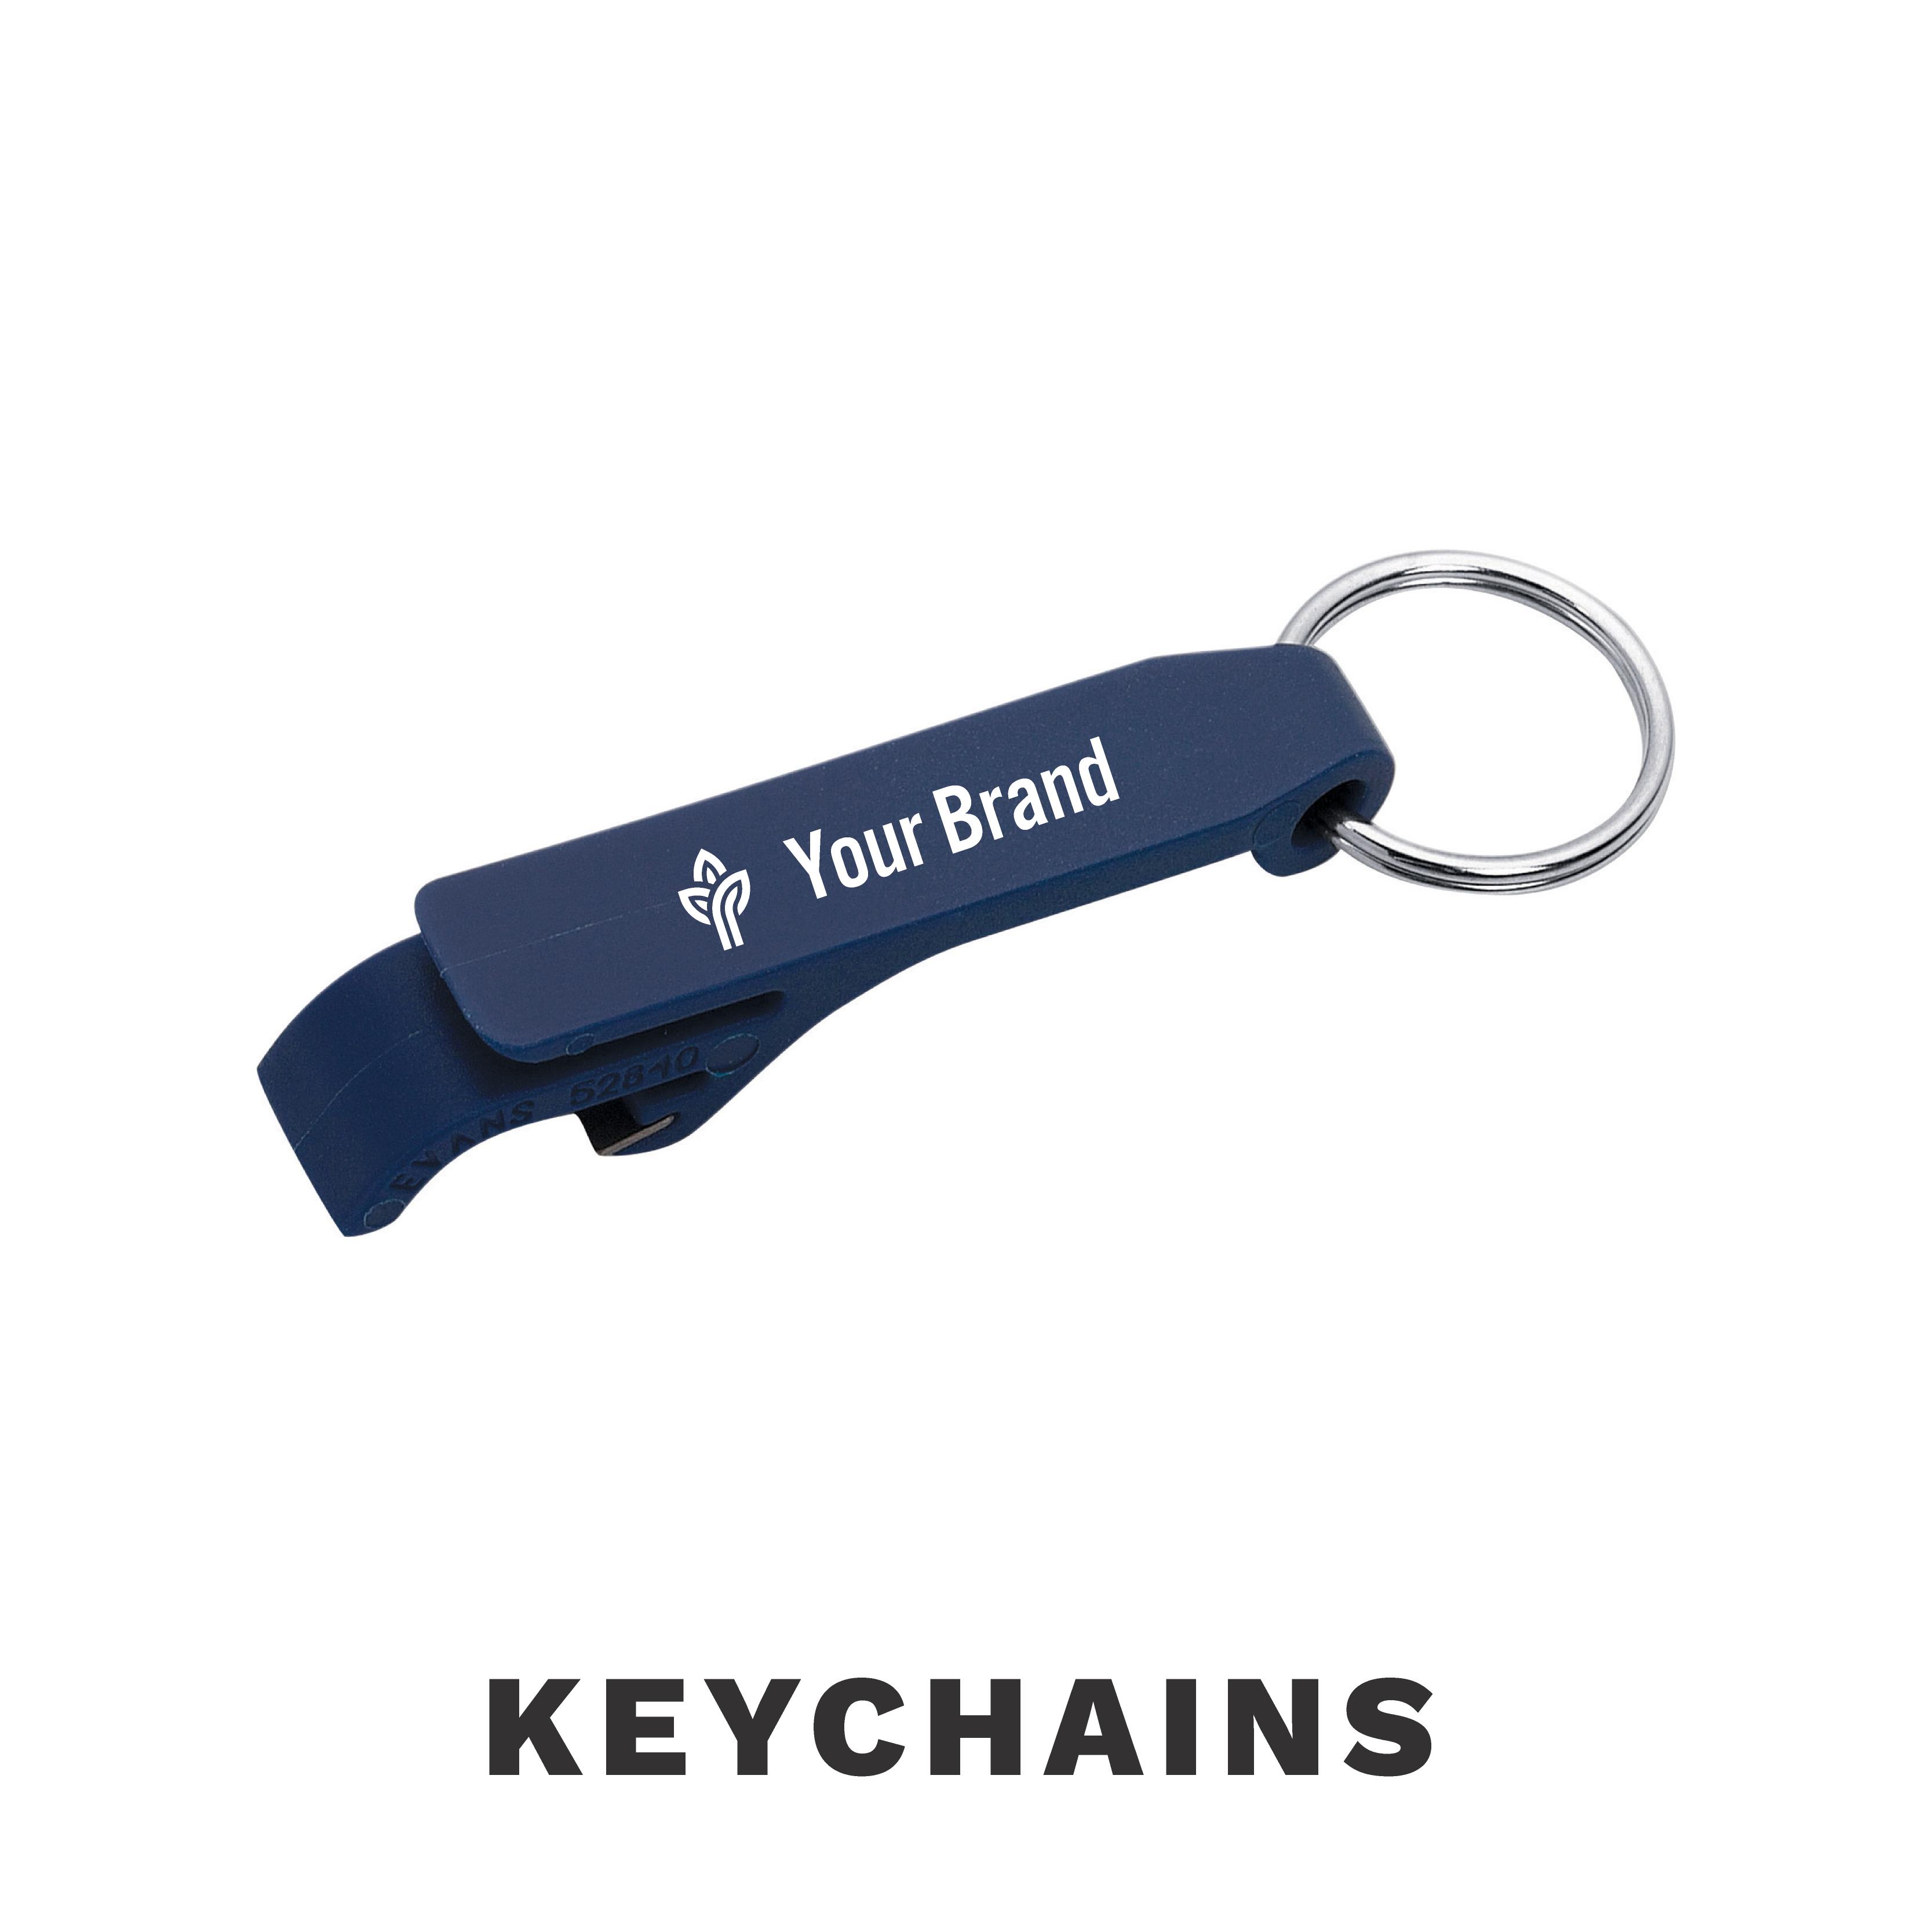 Your brand keychain